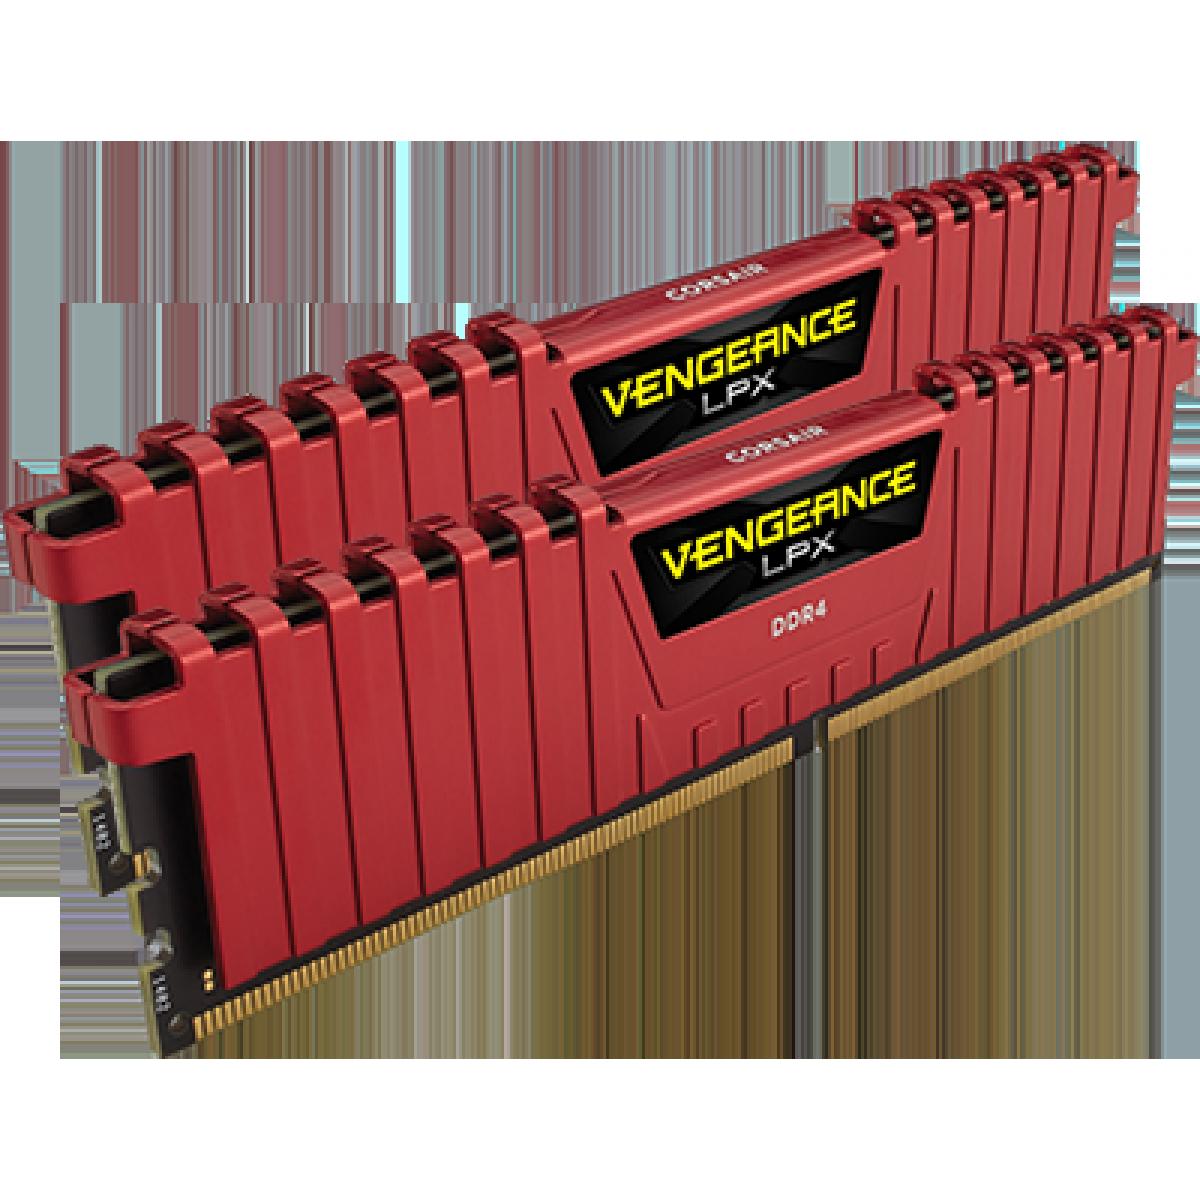 Memória DDR4 Corsair Vengeance LPX 16GB, Red(2x8GB) 3200MHz, CMK16GX4M2B3200C16R